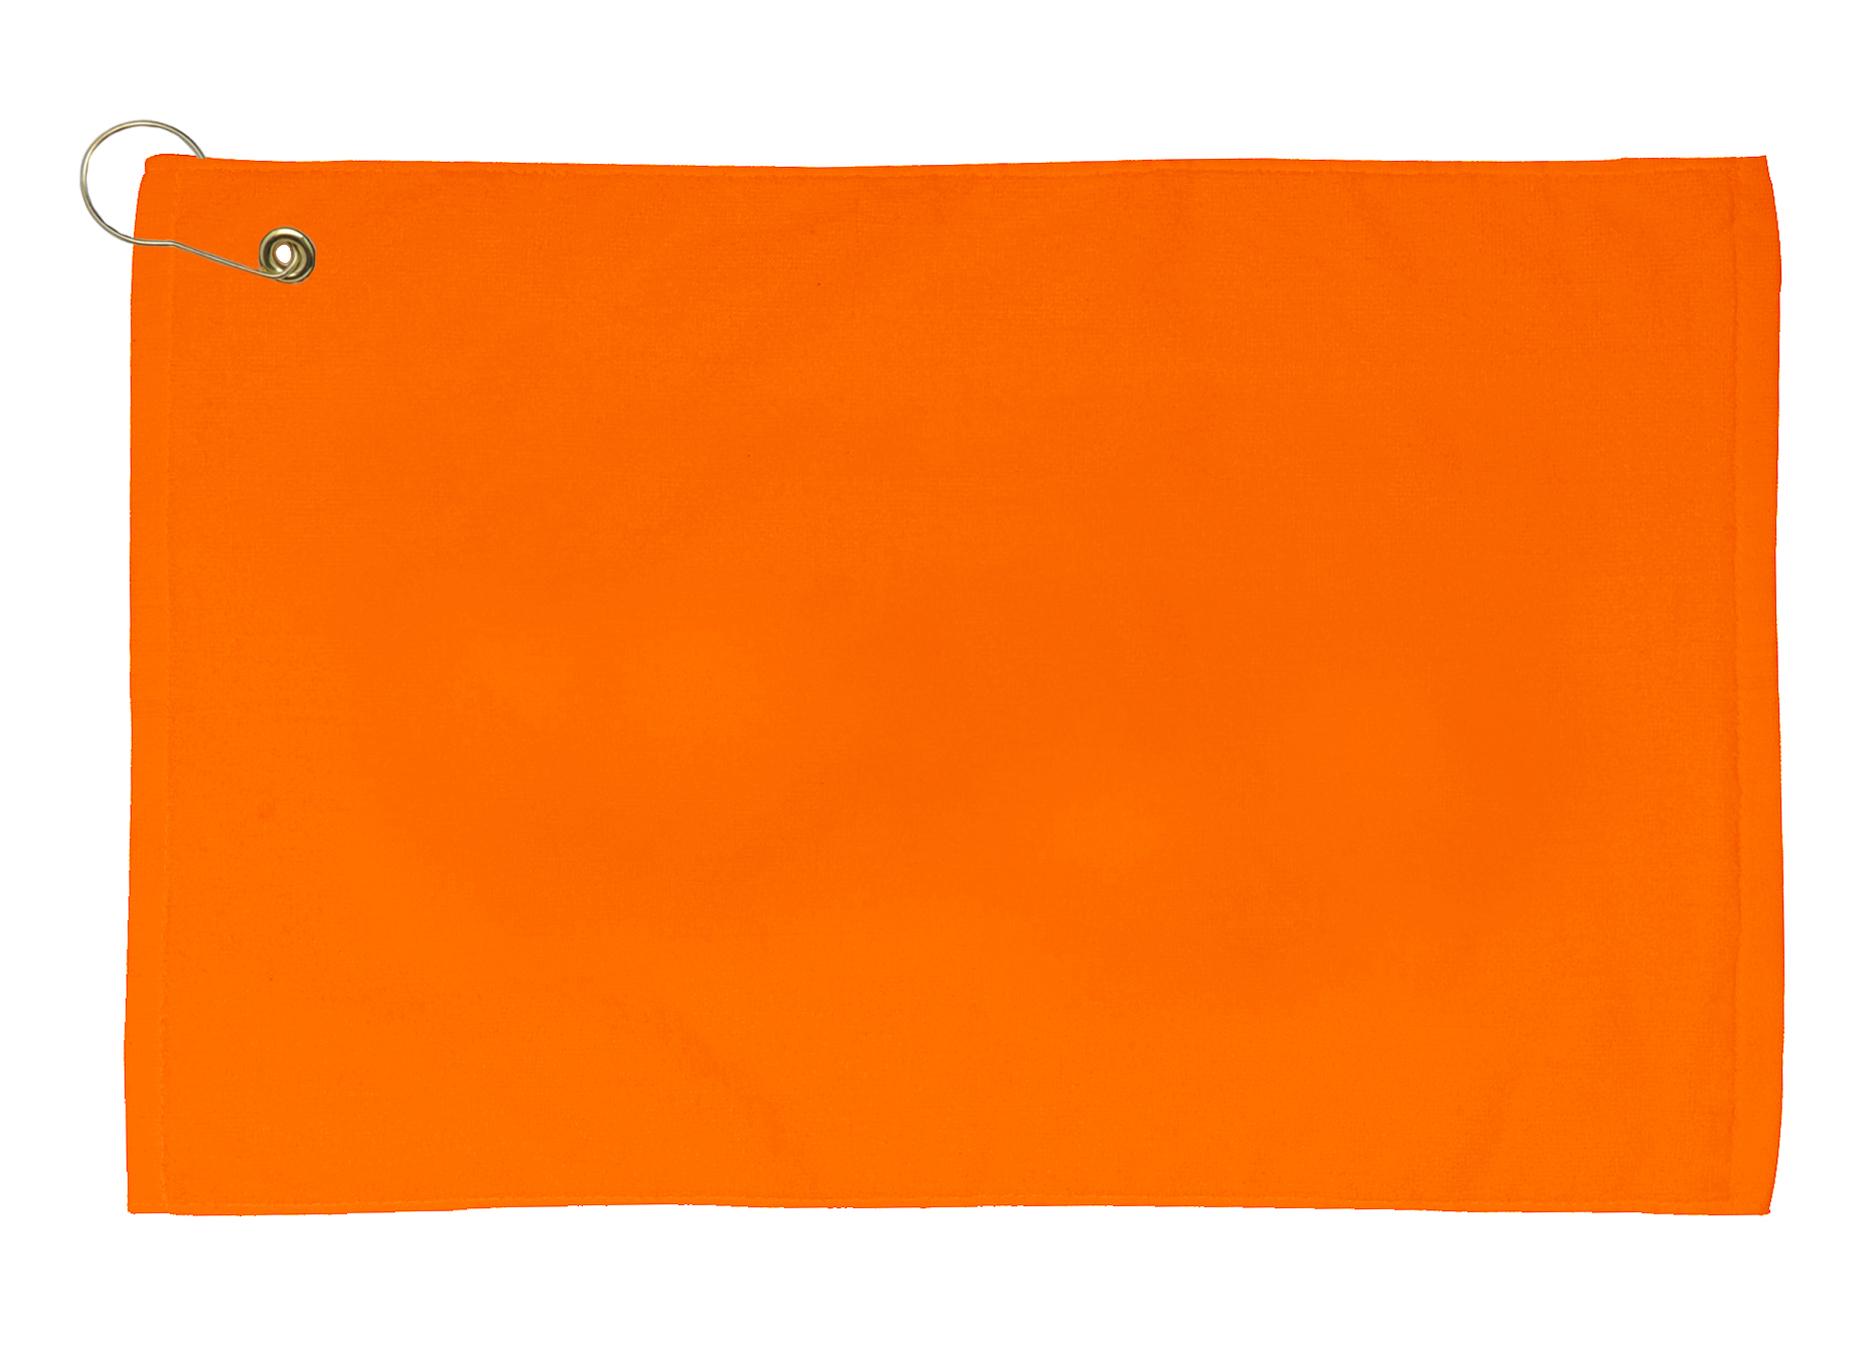 TRU24CG_orange